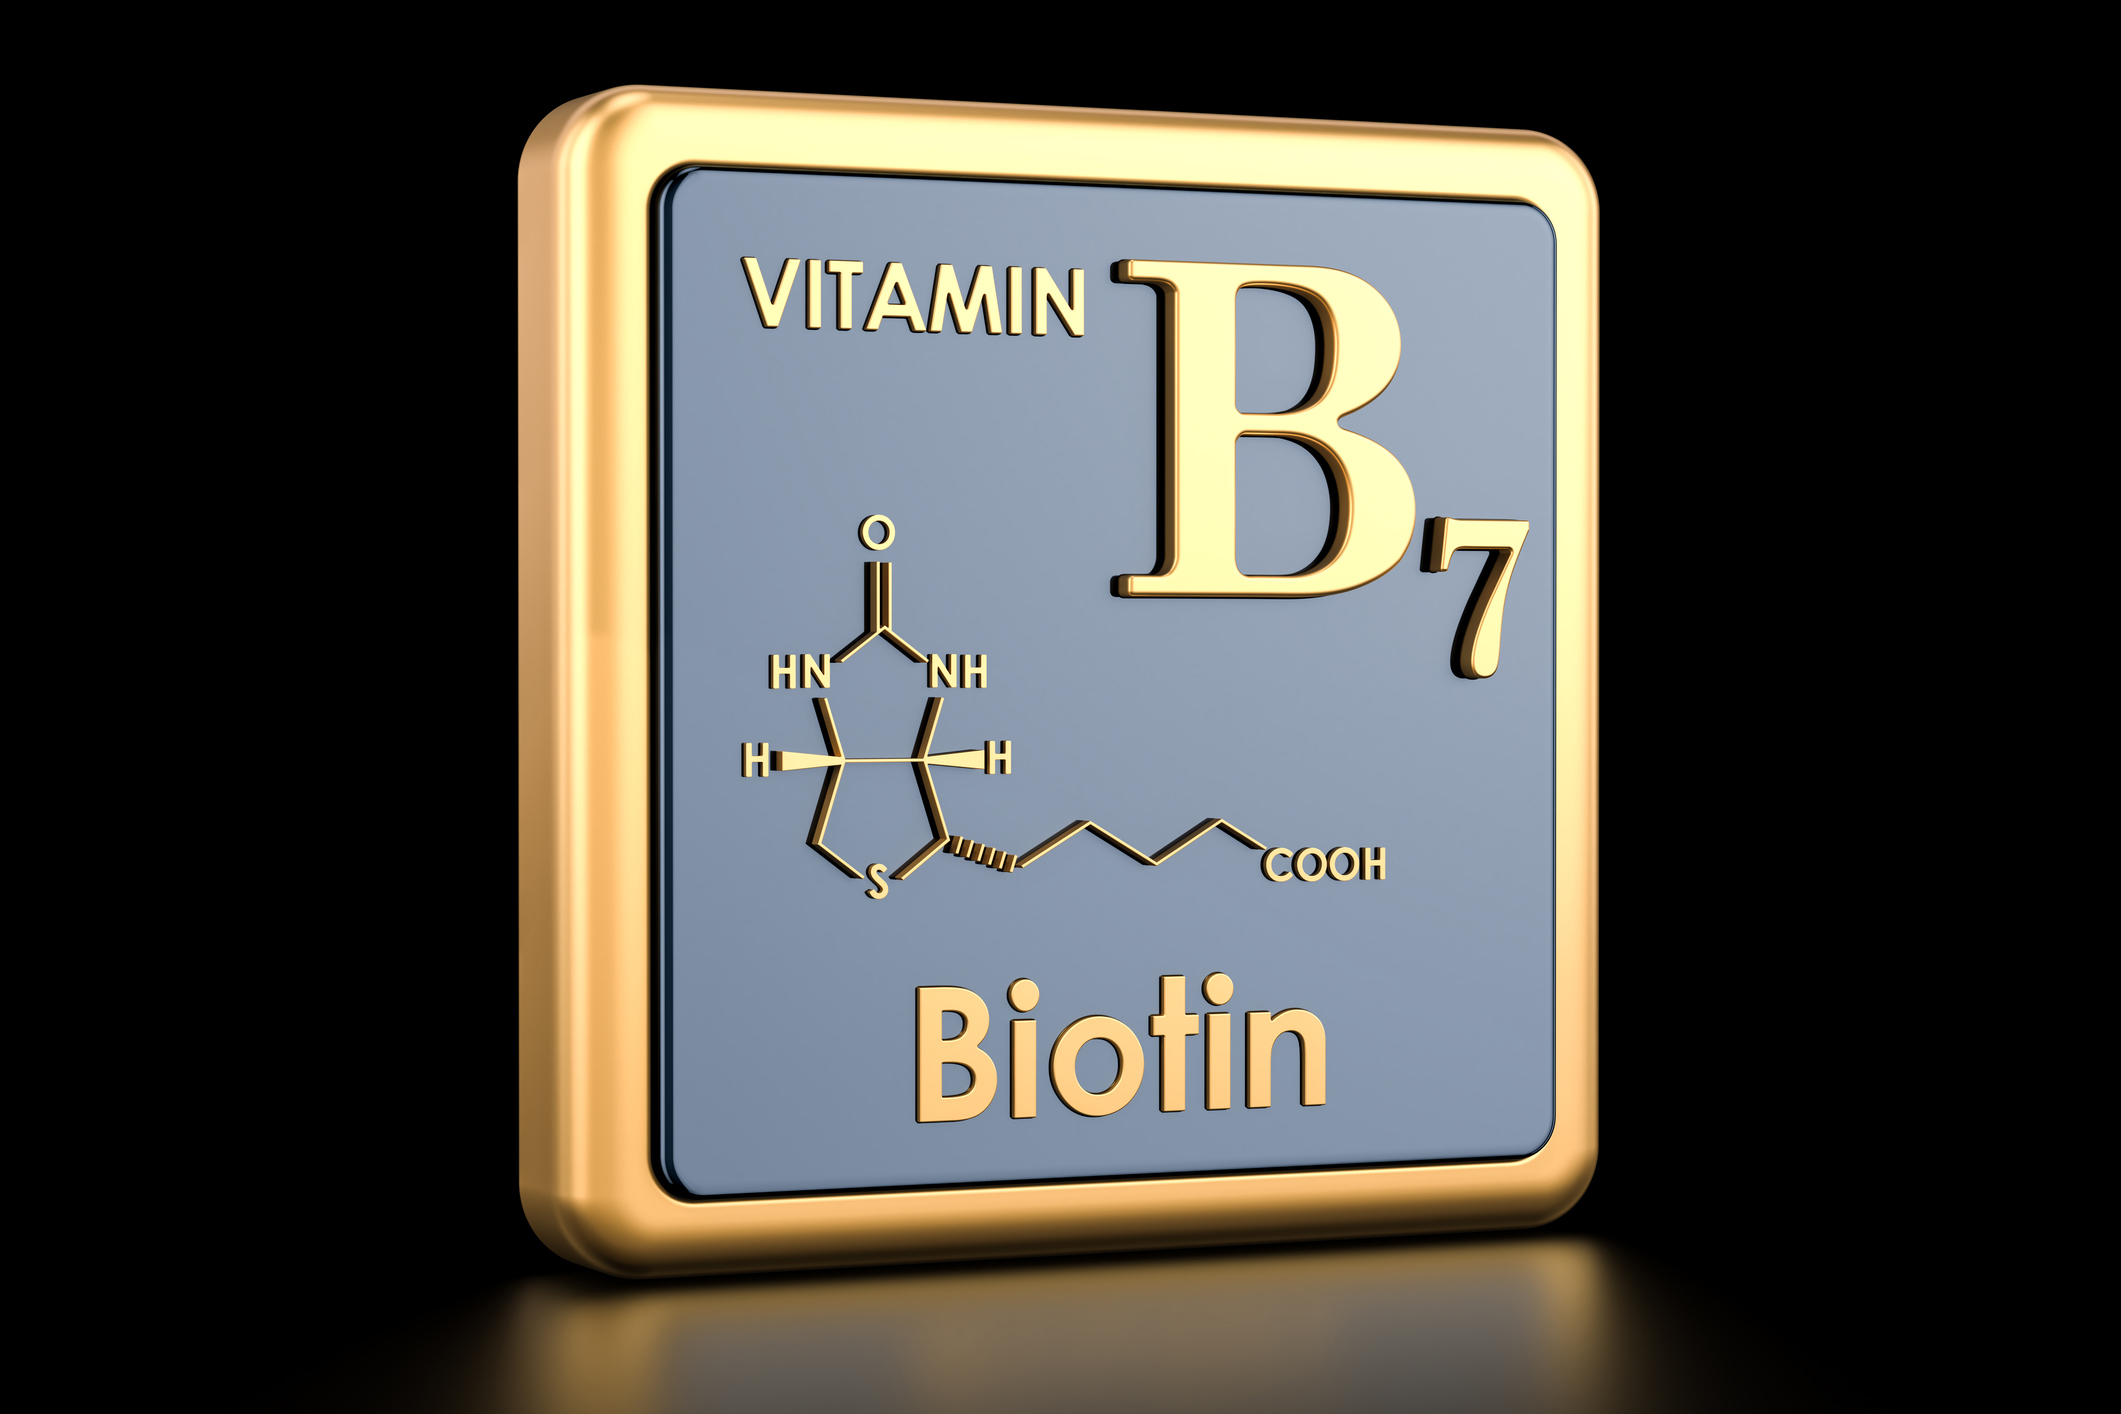 iStock-1017858030 Biotin.jpg